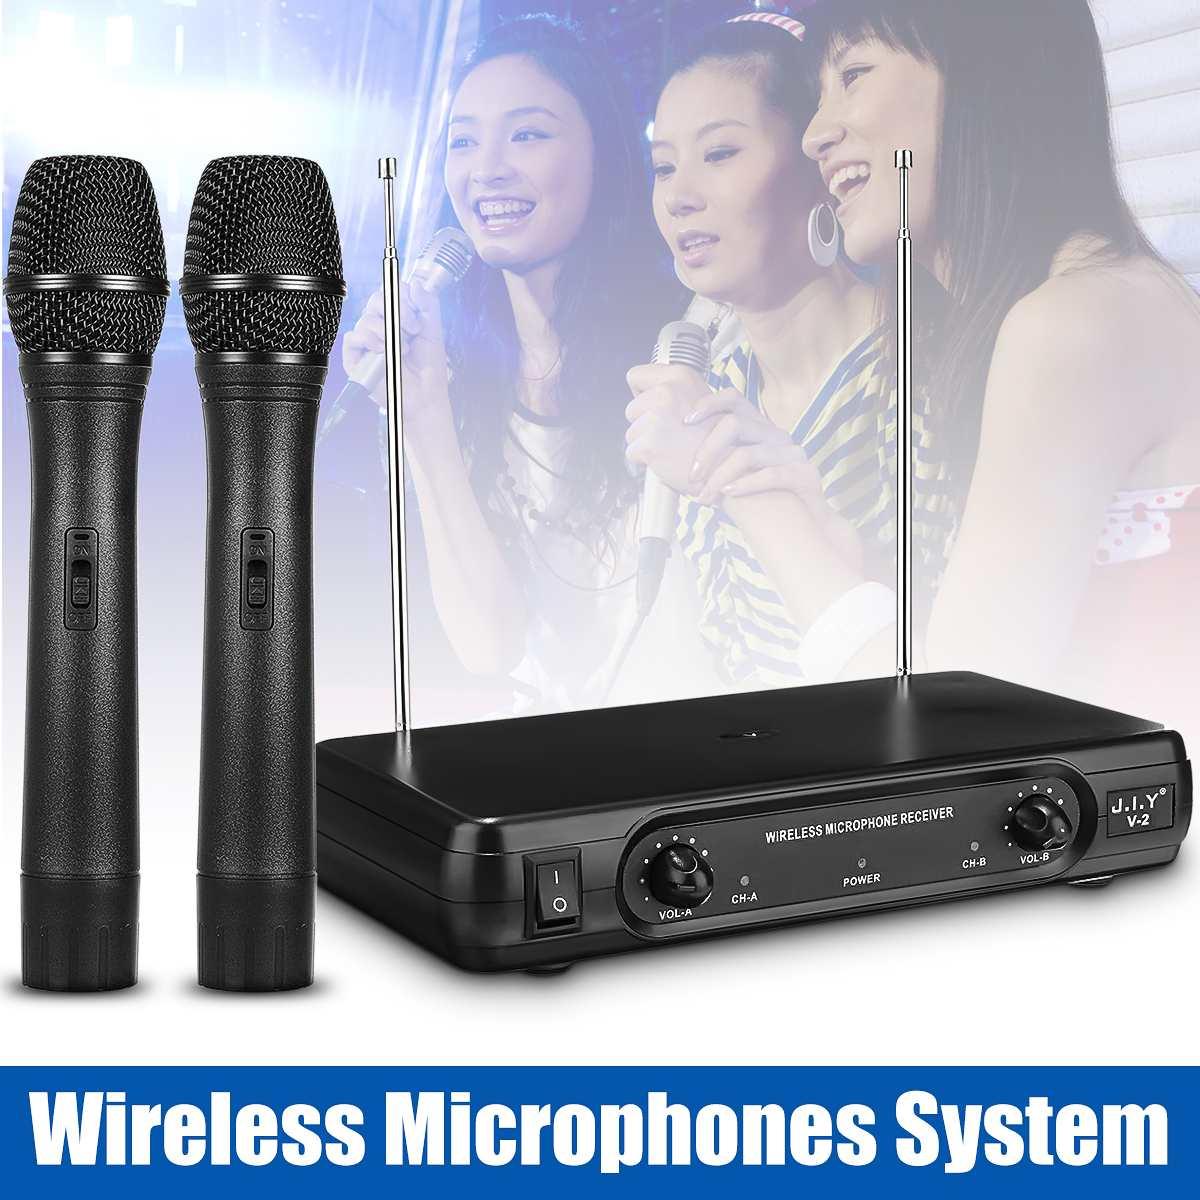 sem fio microfone handheld microfone receptor microfones karaoke com 2 microfones